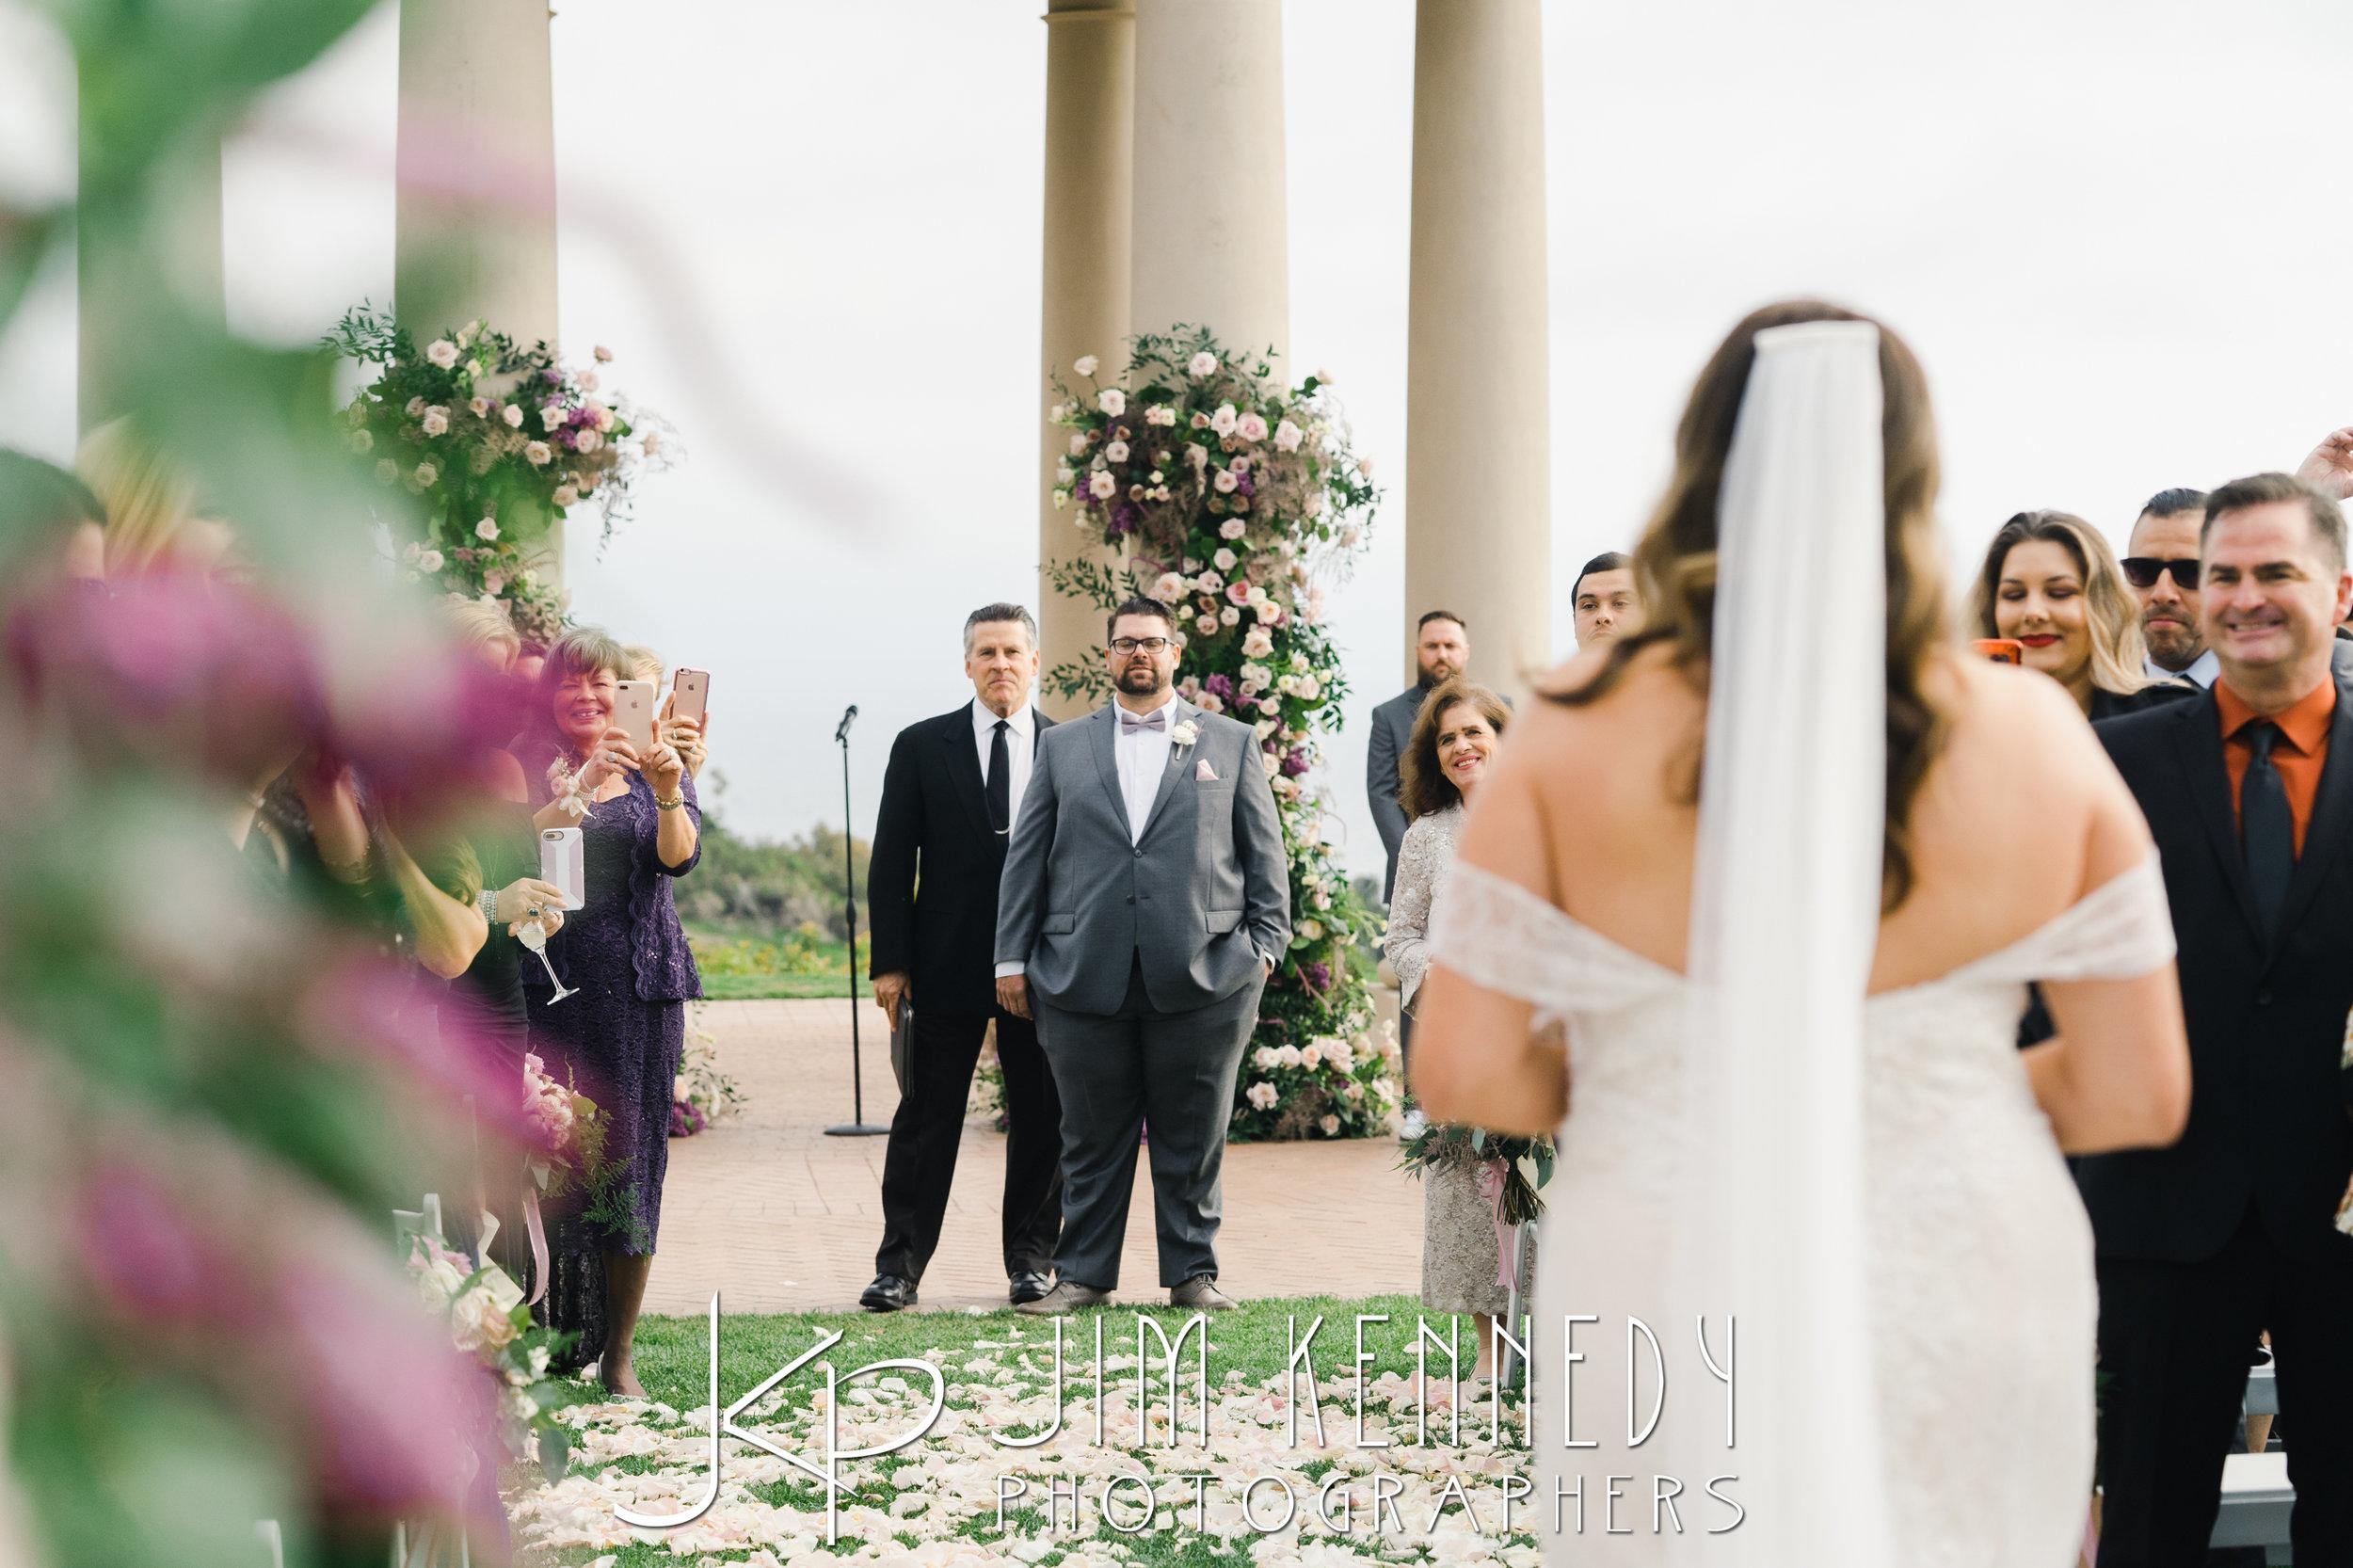 pelican-hill-wedding-jim-kenedy-photographers_0110.JPG